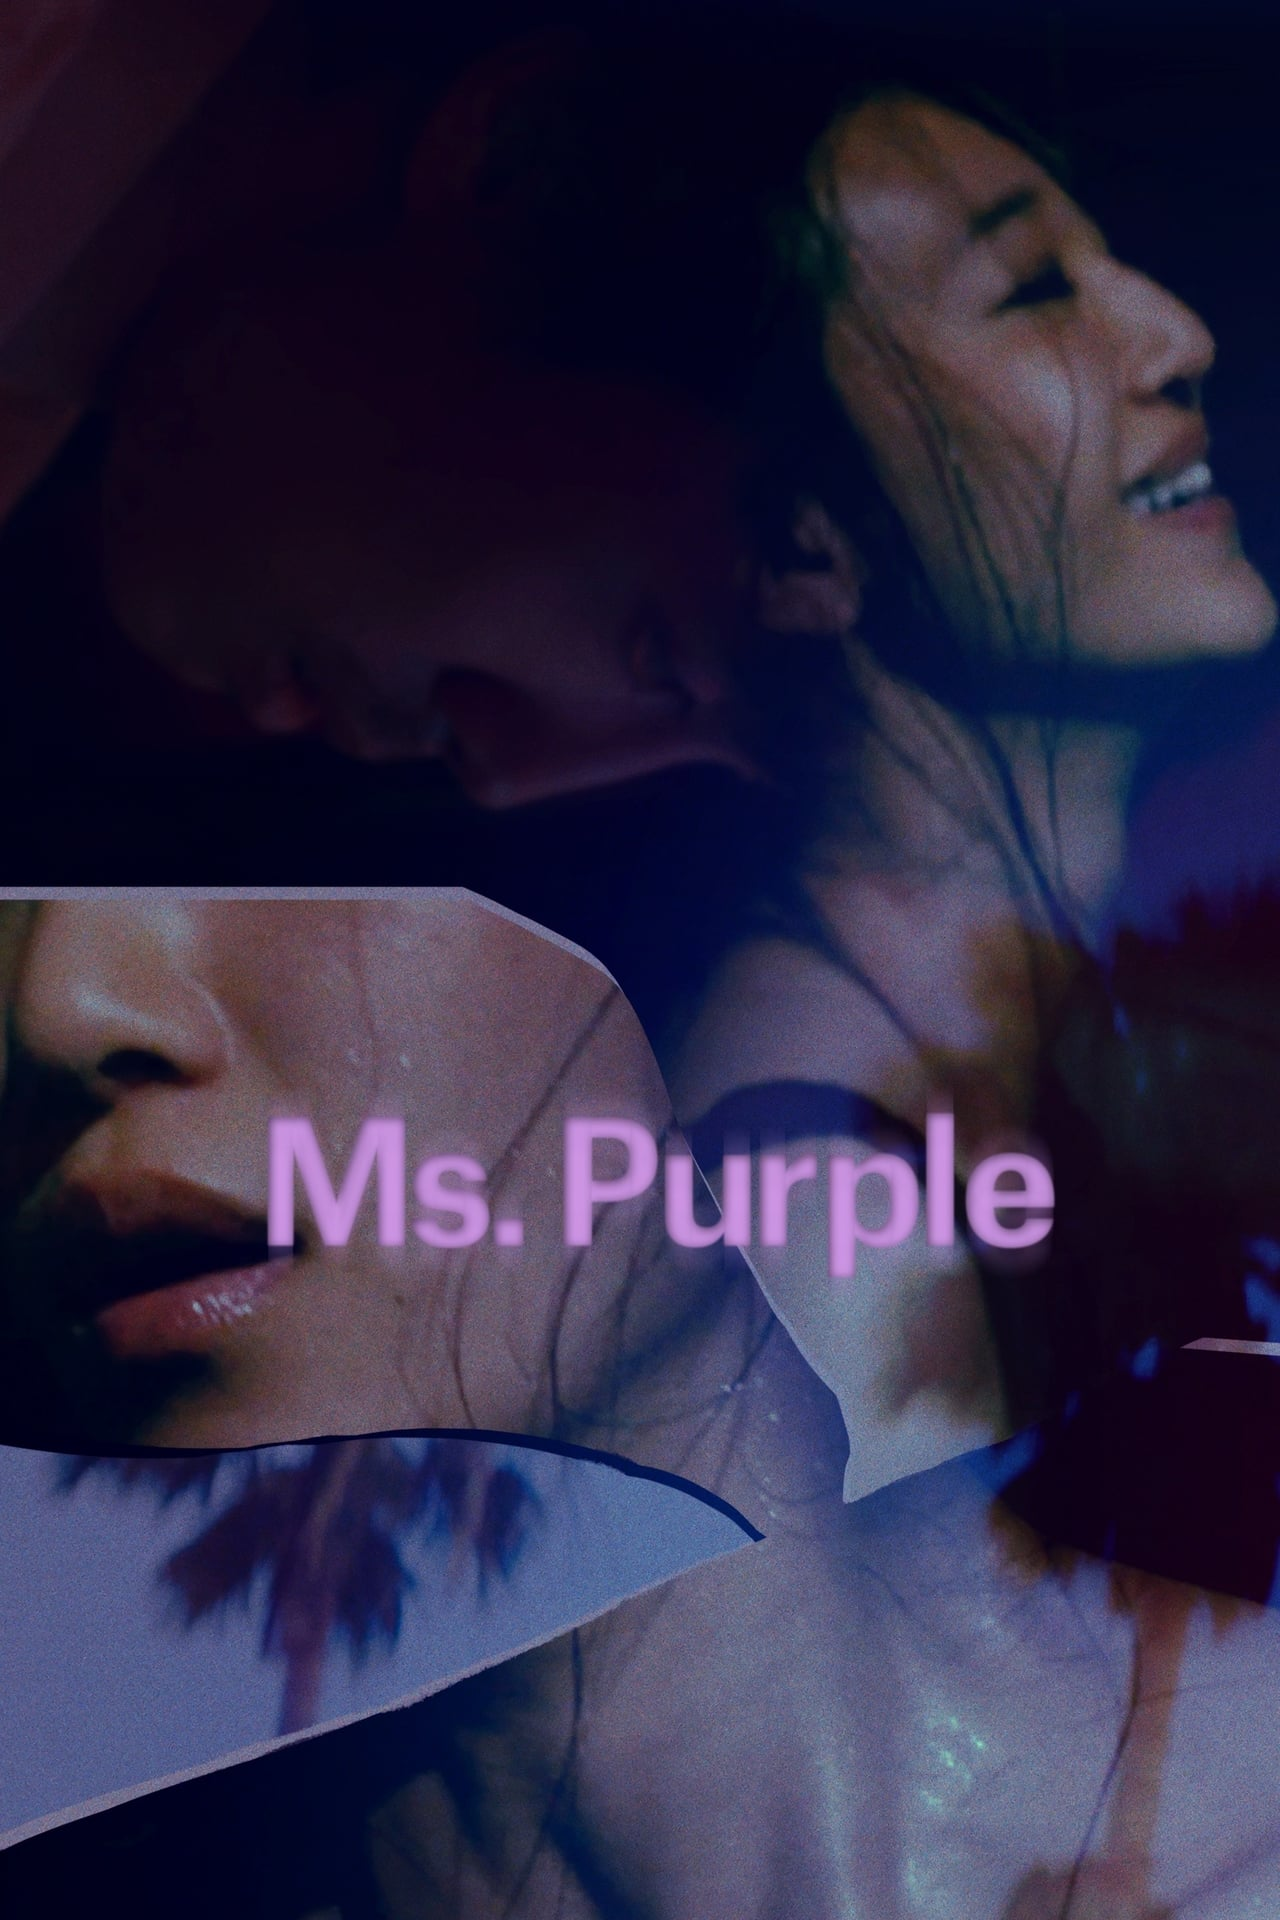 Ms. Purple poster